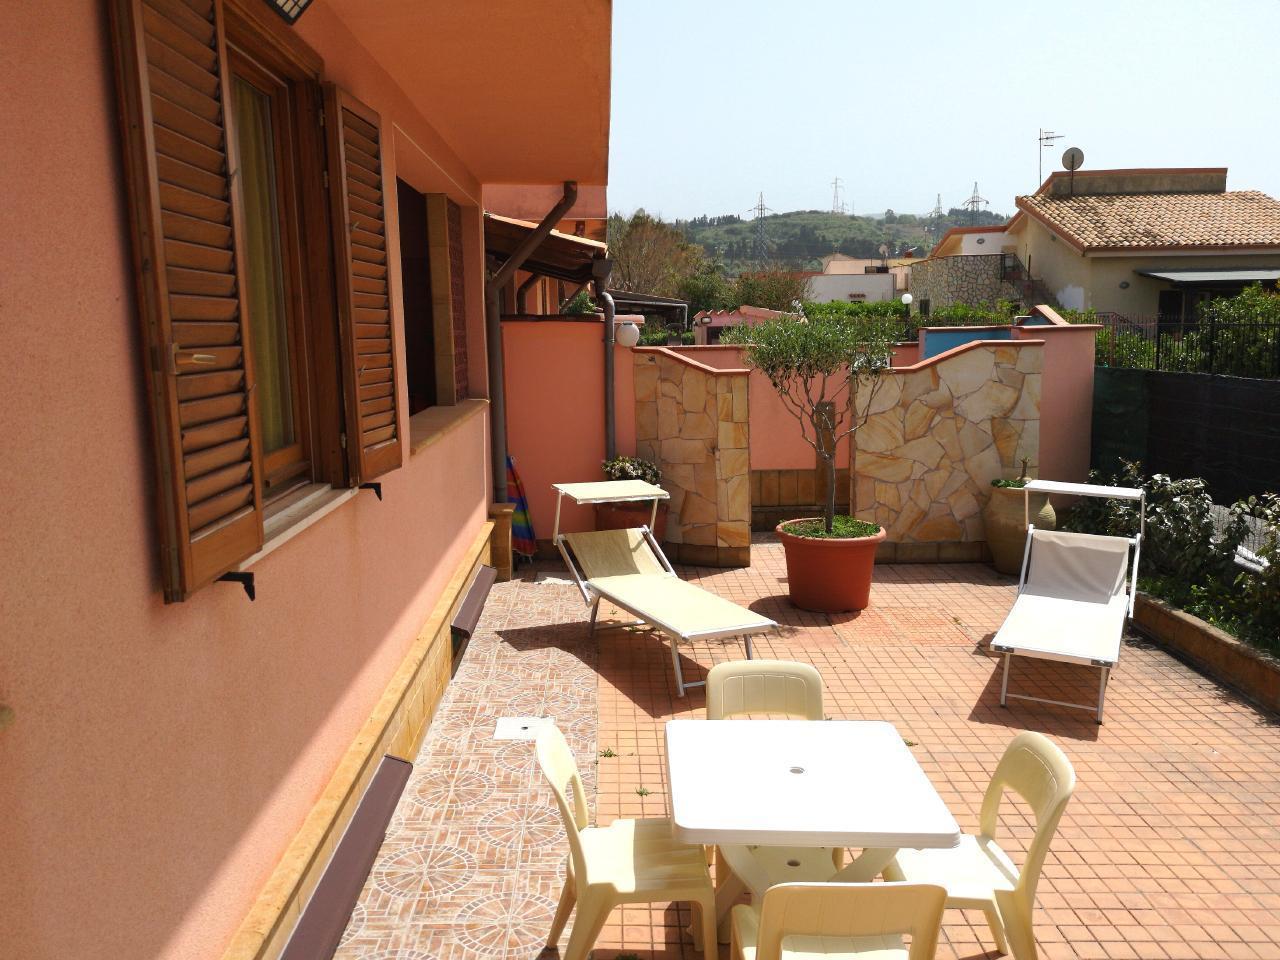 Maison de vacances Costa Mediterranea Ferienhaus (2129632), Cefalù, Palermo, Sicile, Italie, image 22